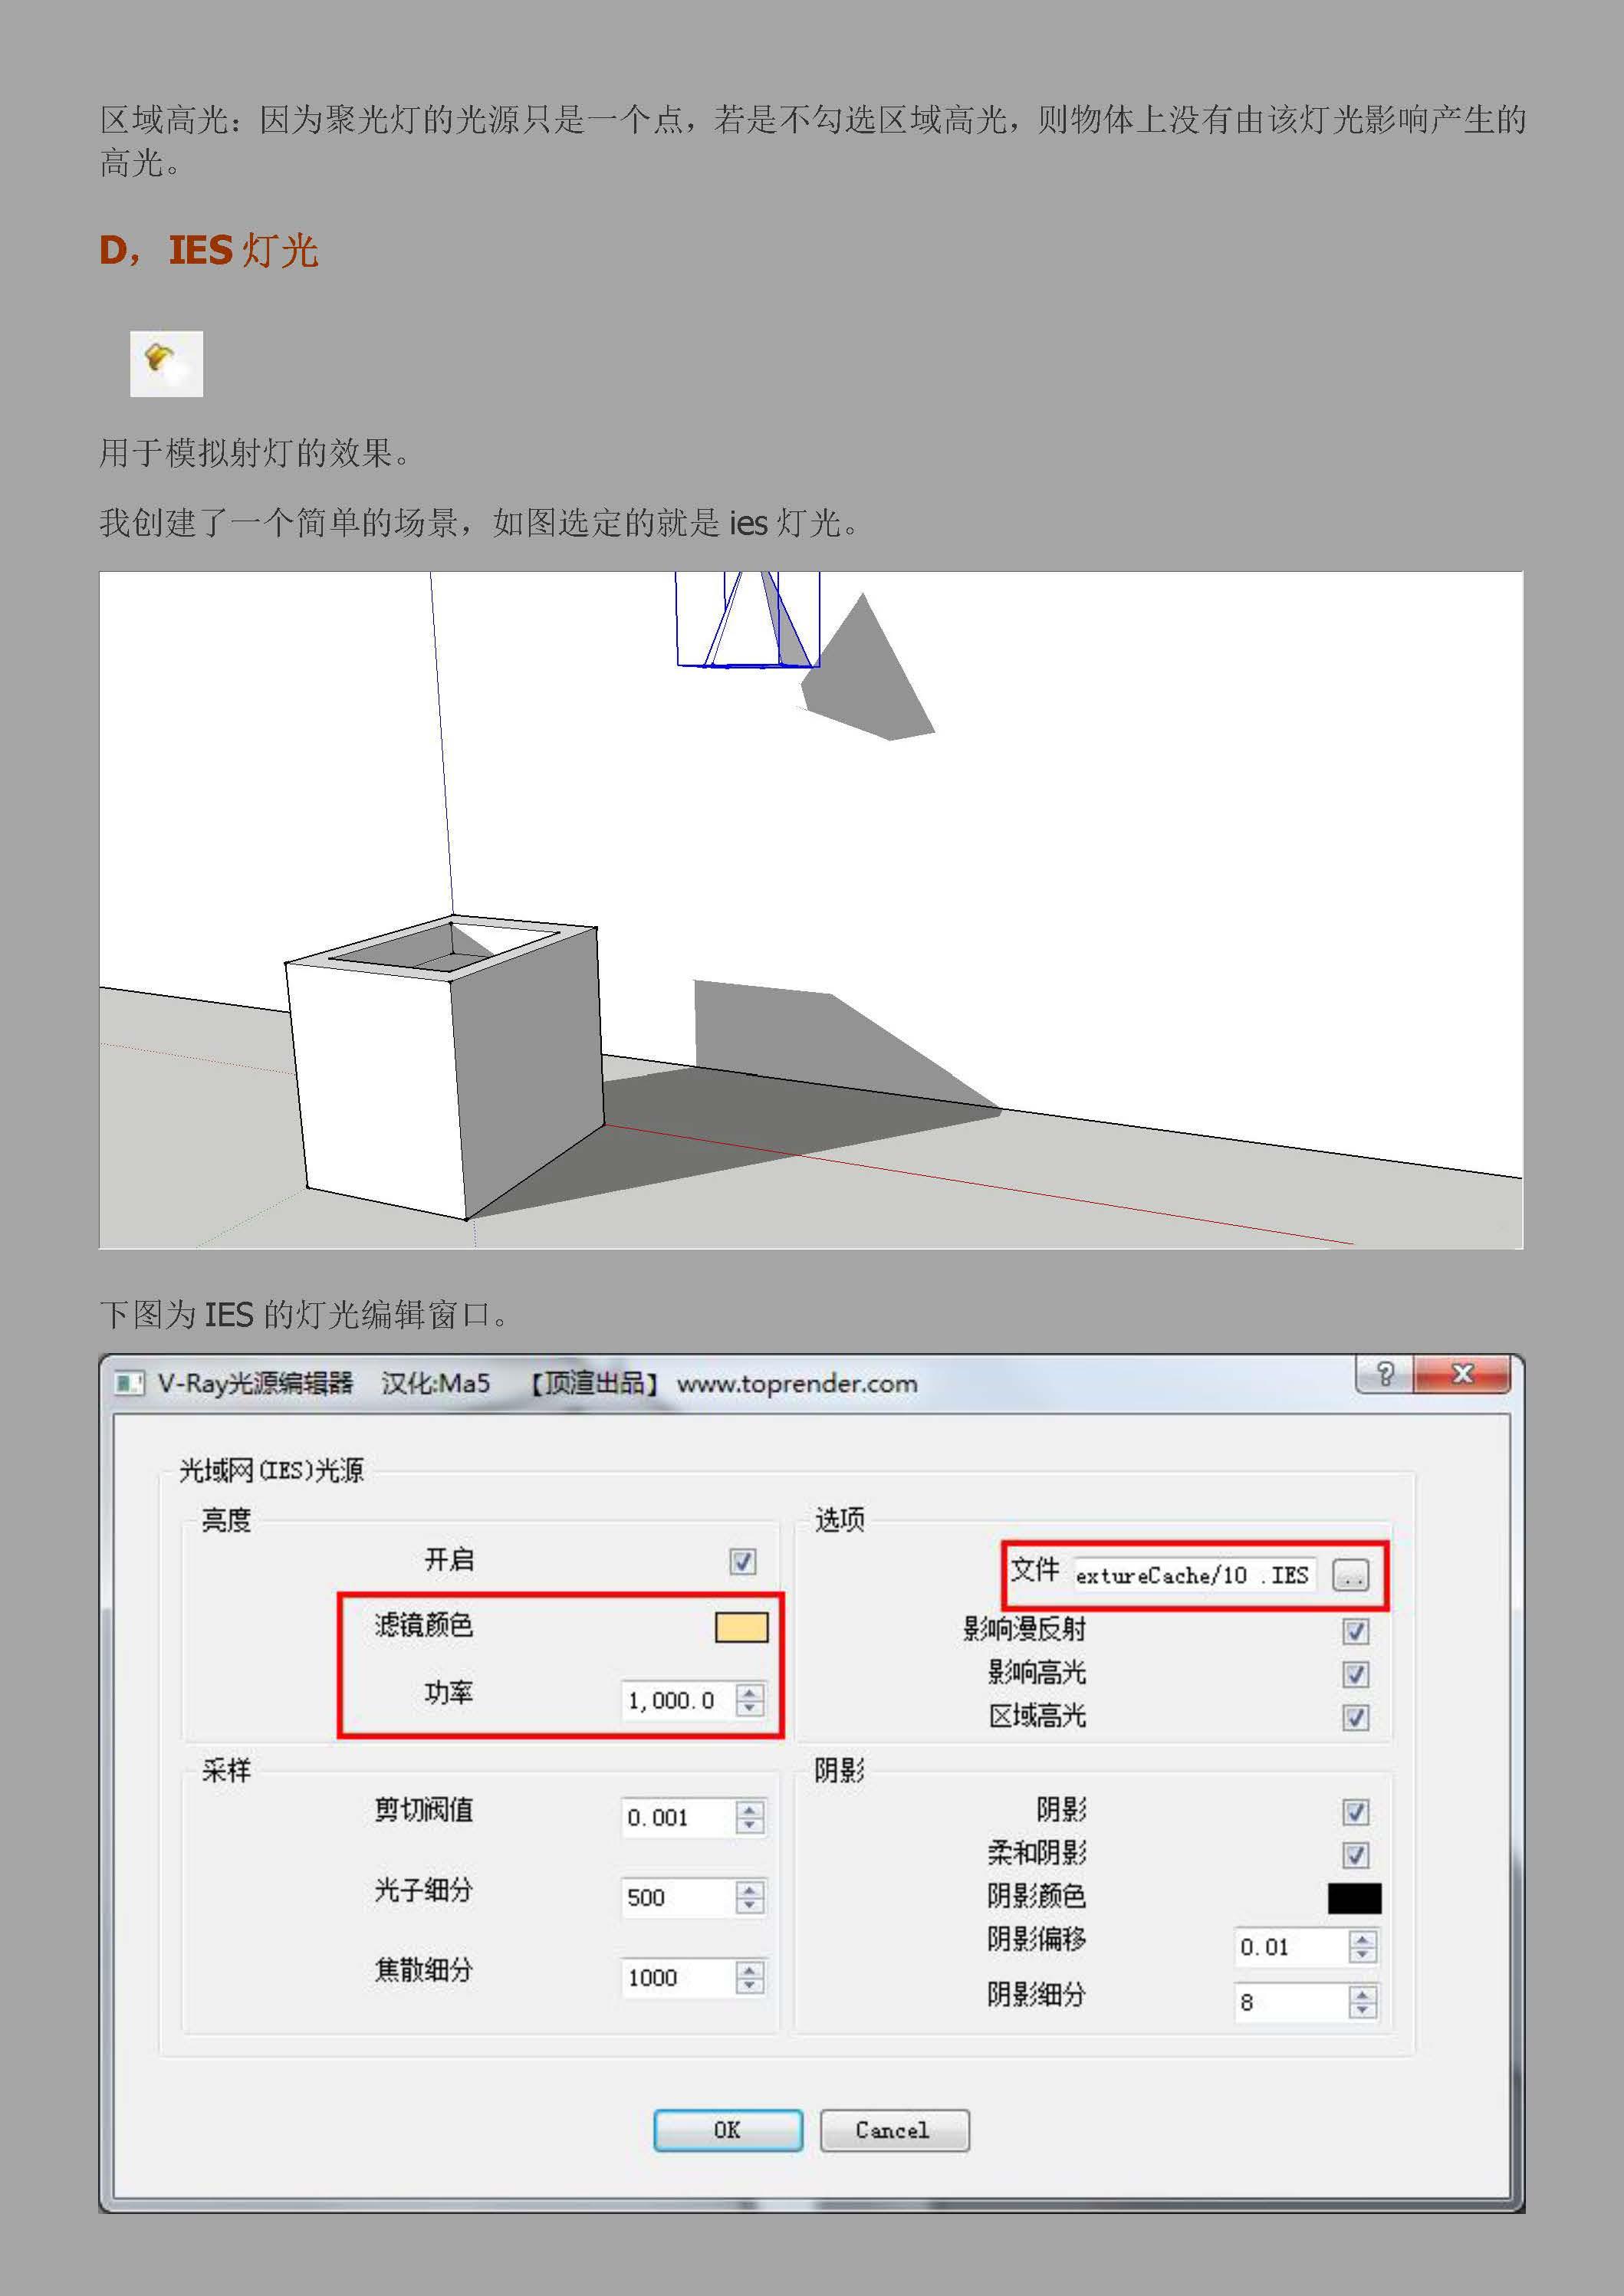 http://img.zhux2.com/editor1588920595503610.jpg